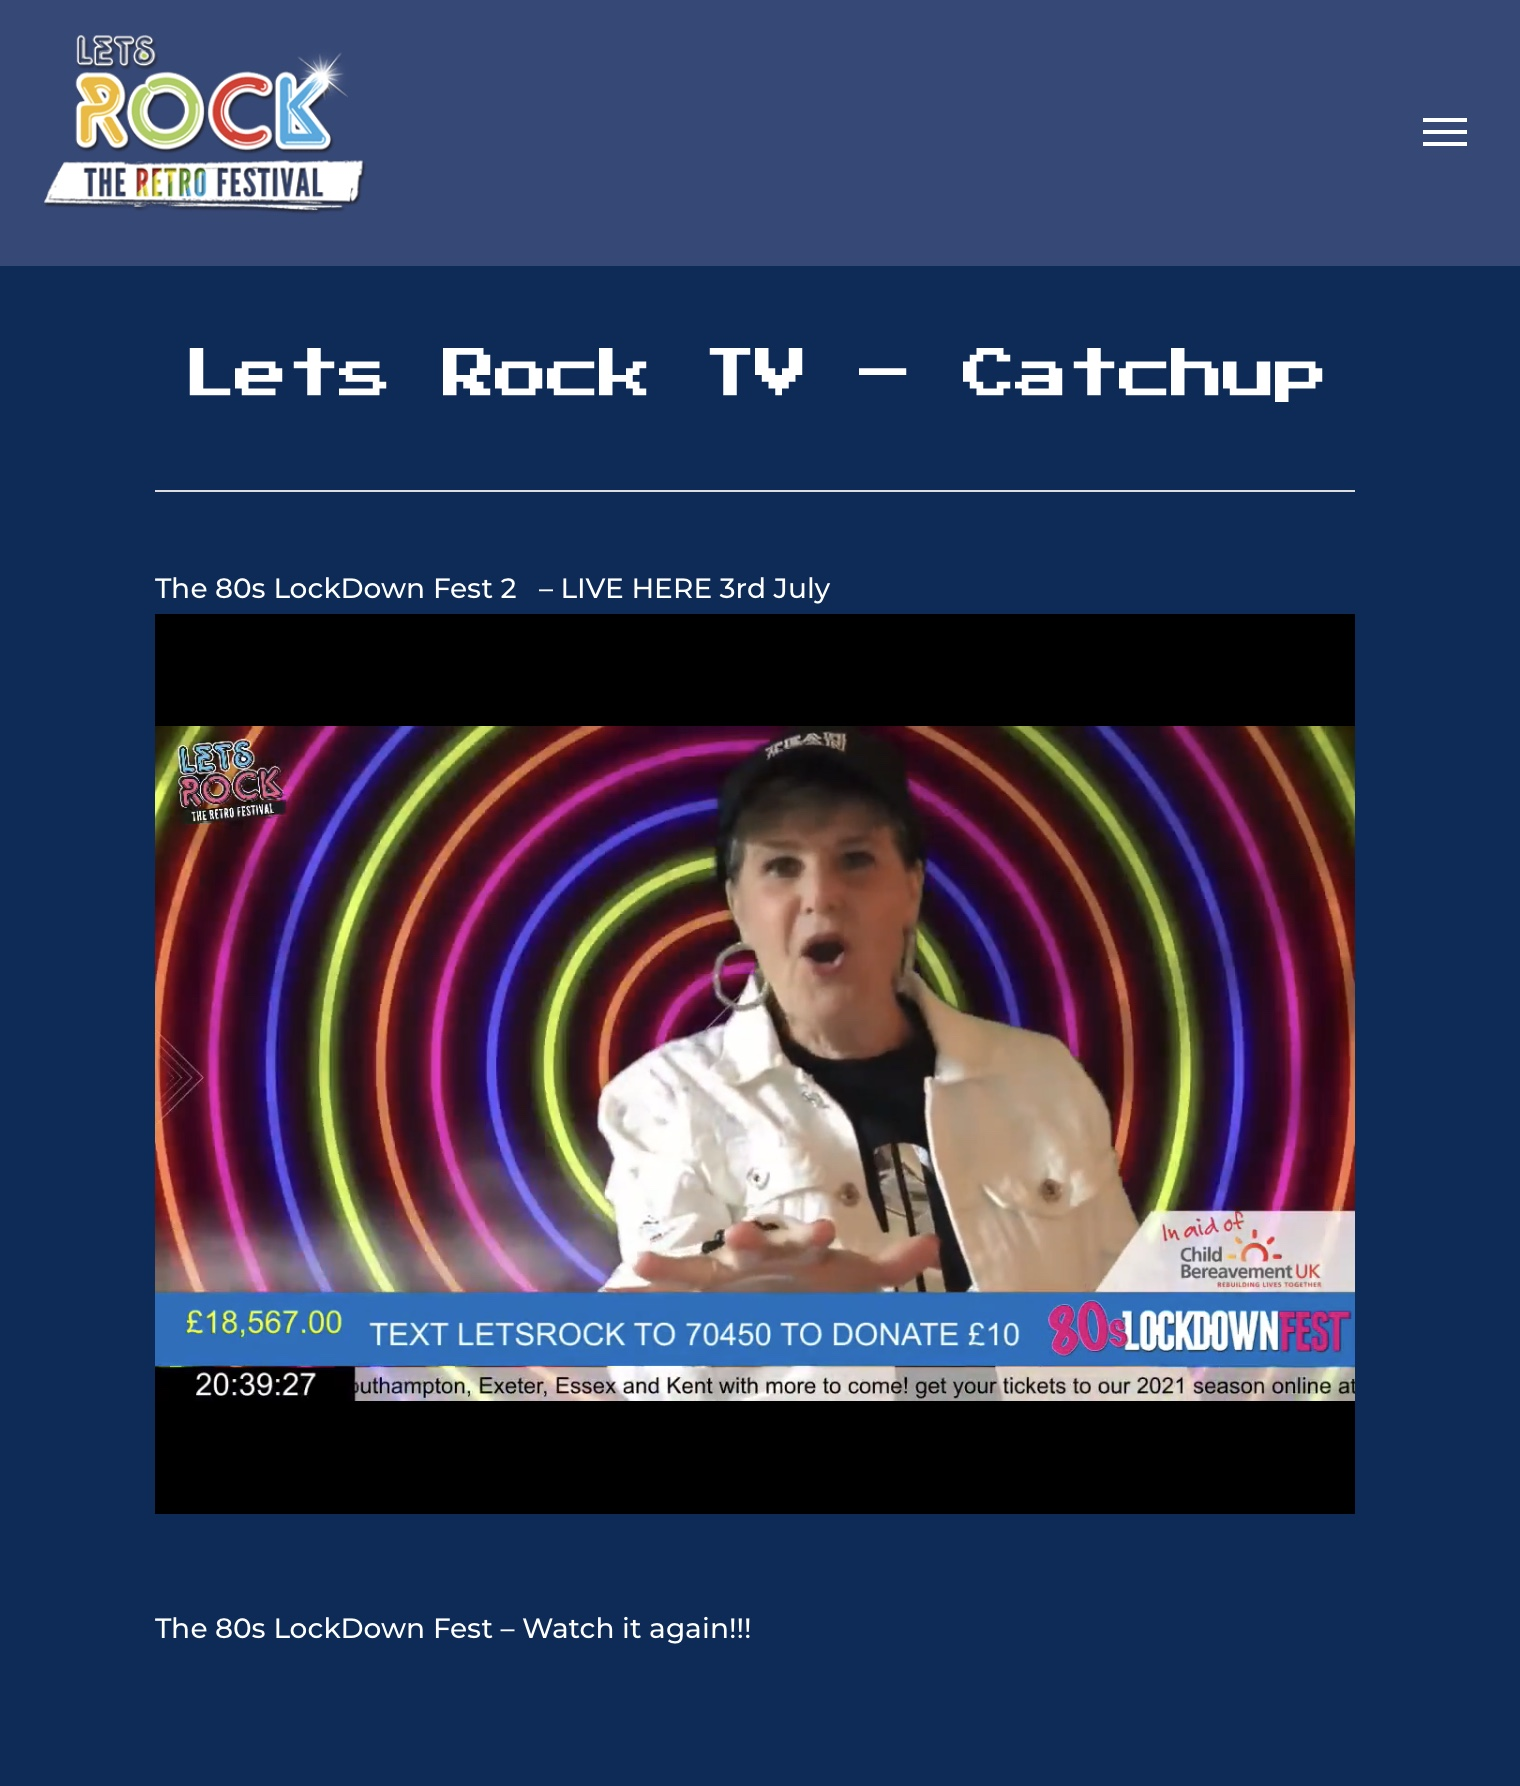 Lets Rock TV